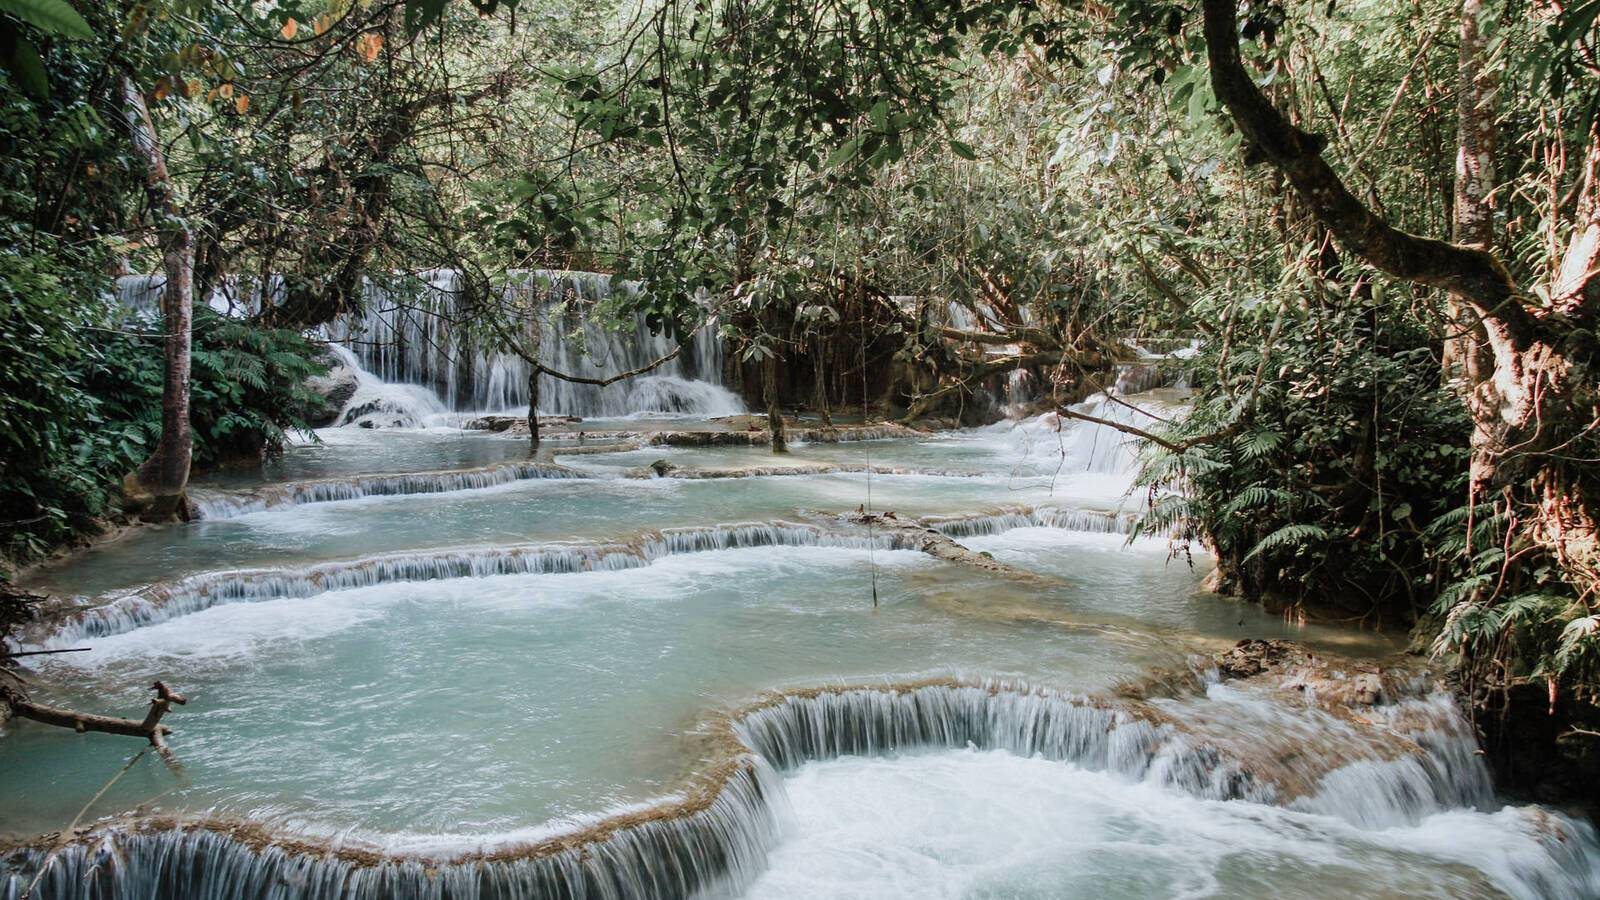 Laos Luang Prabang water stream christine wehrmeier